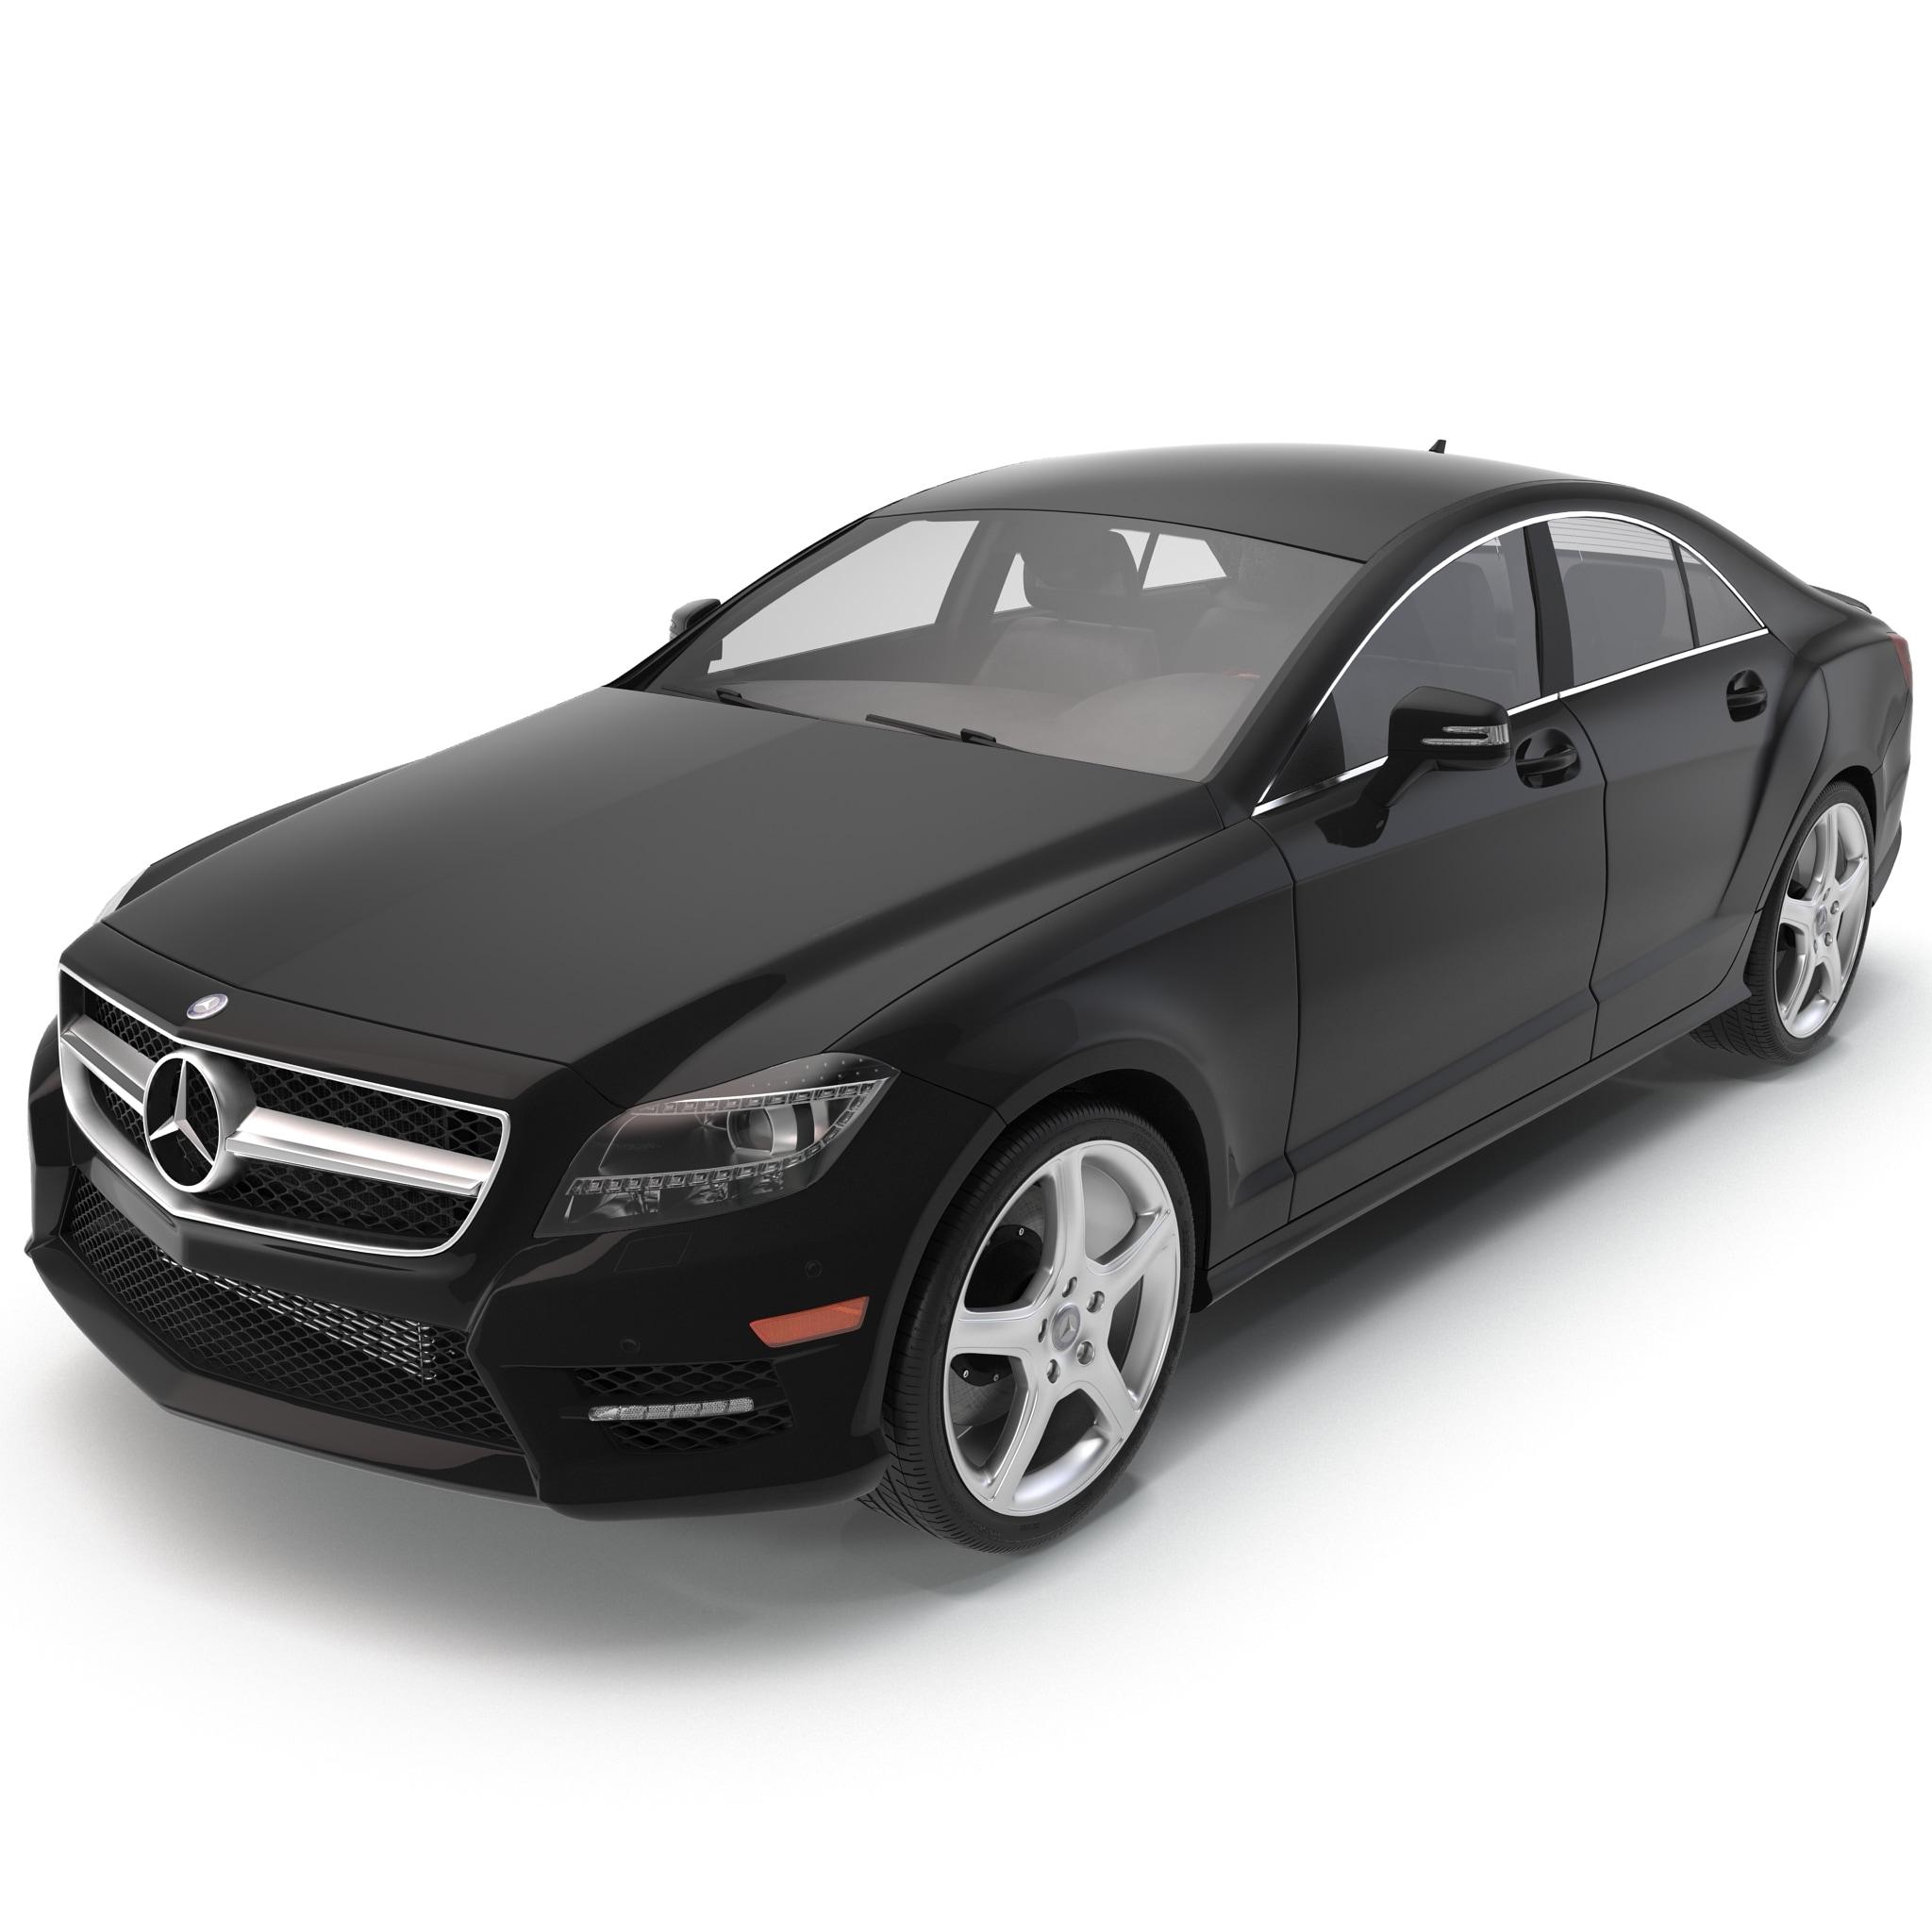 mercedes-benz cls-class coupe 2014 3d model